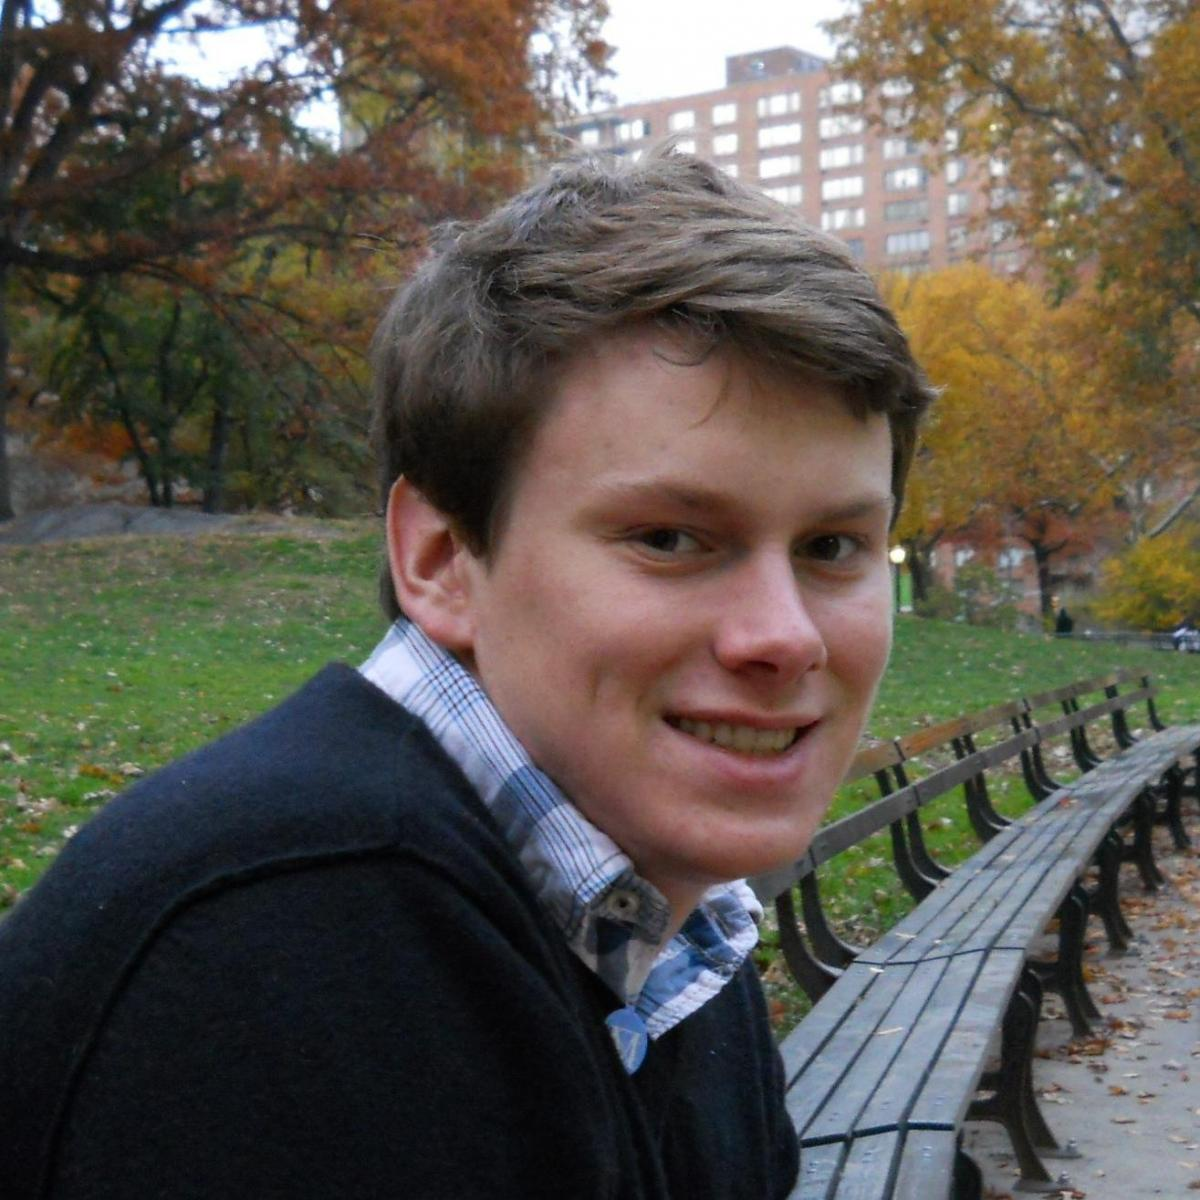 Writer Sean McElwee